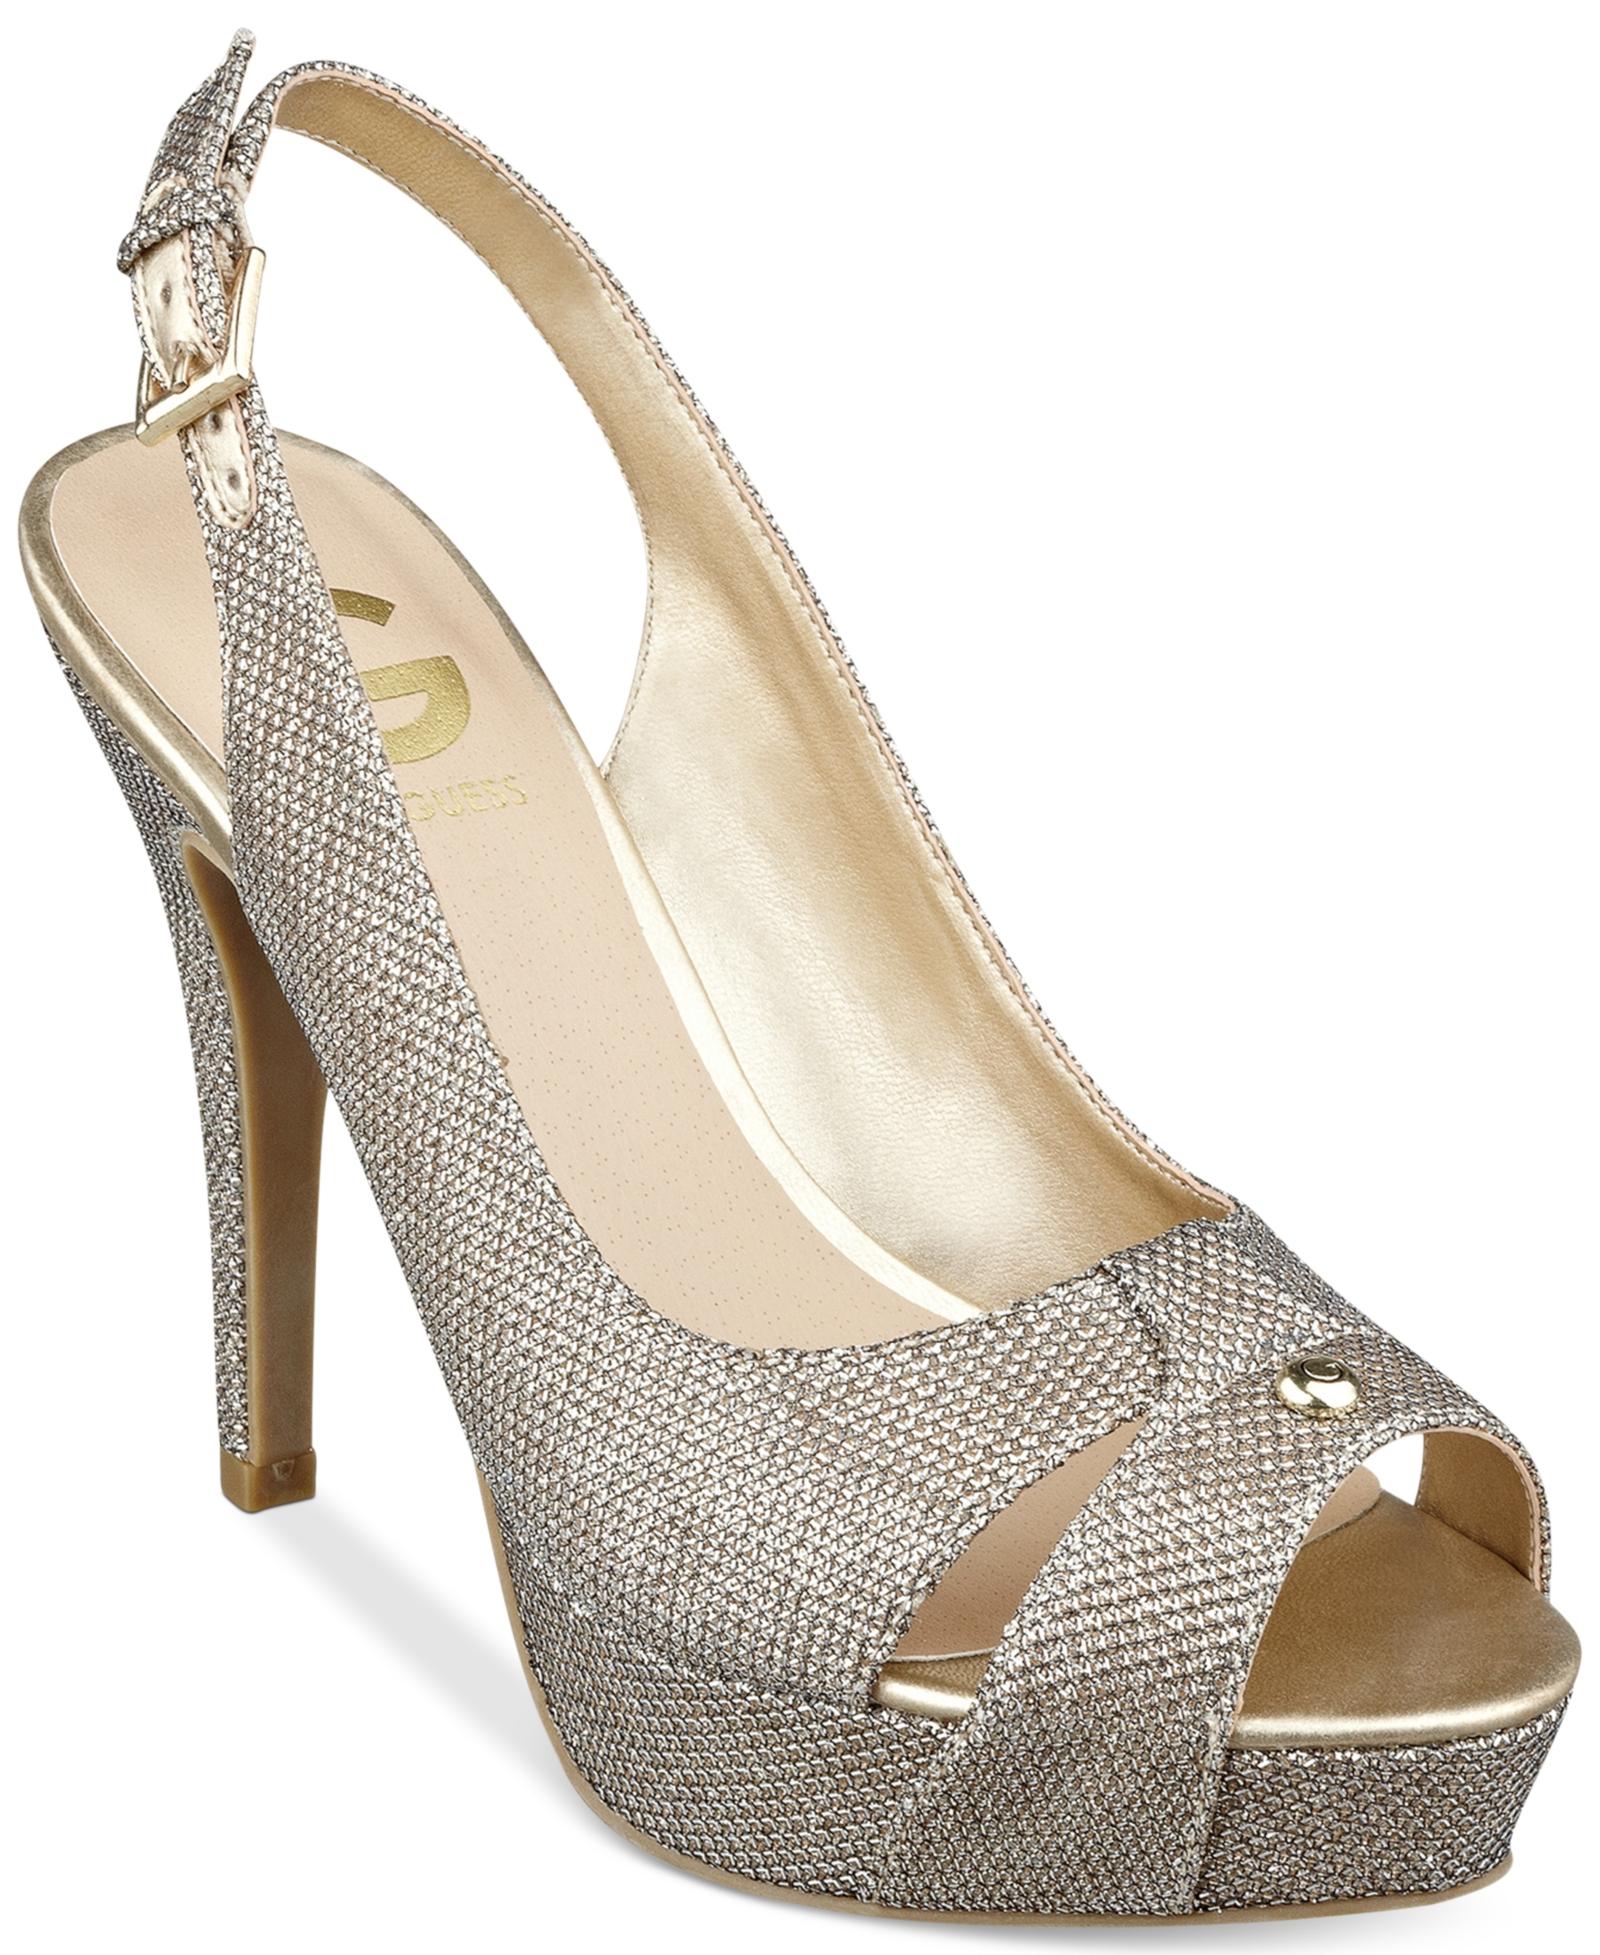 61dc26a89e8 G by Guess Women's Cathy Slingback Platform Pumps Women's Shoes | G ...